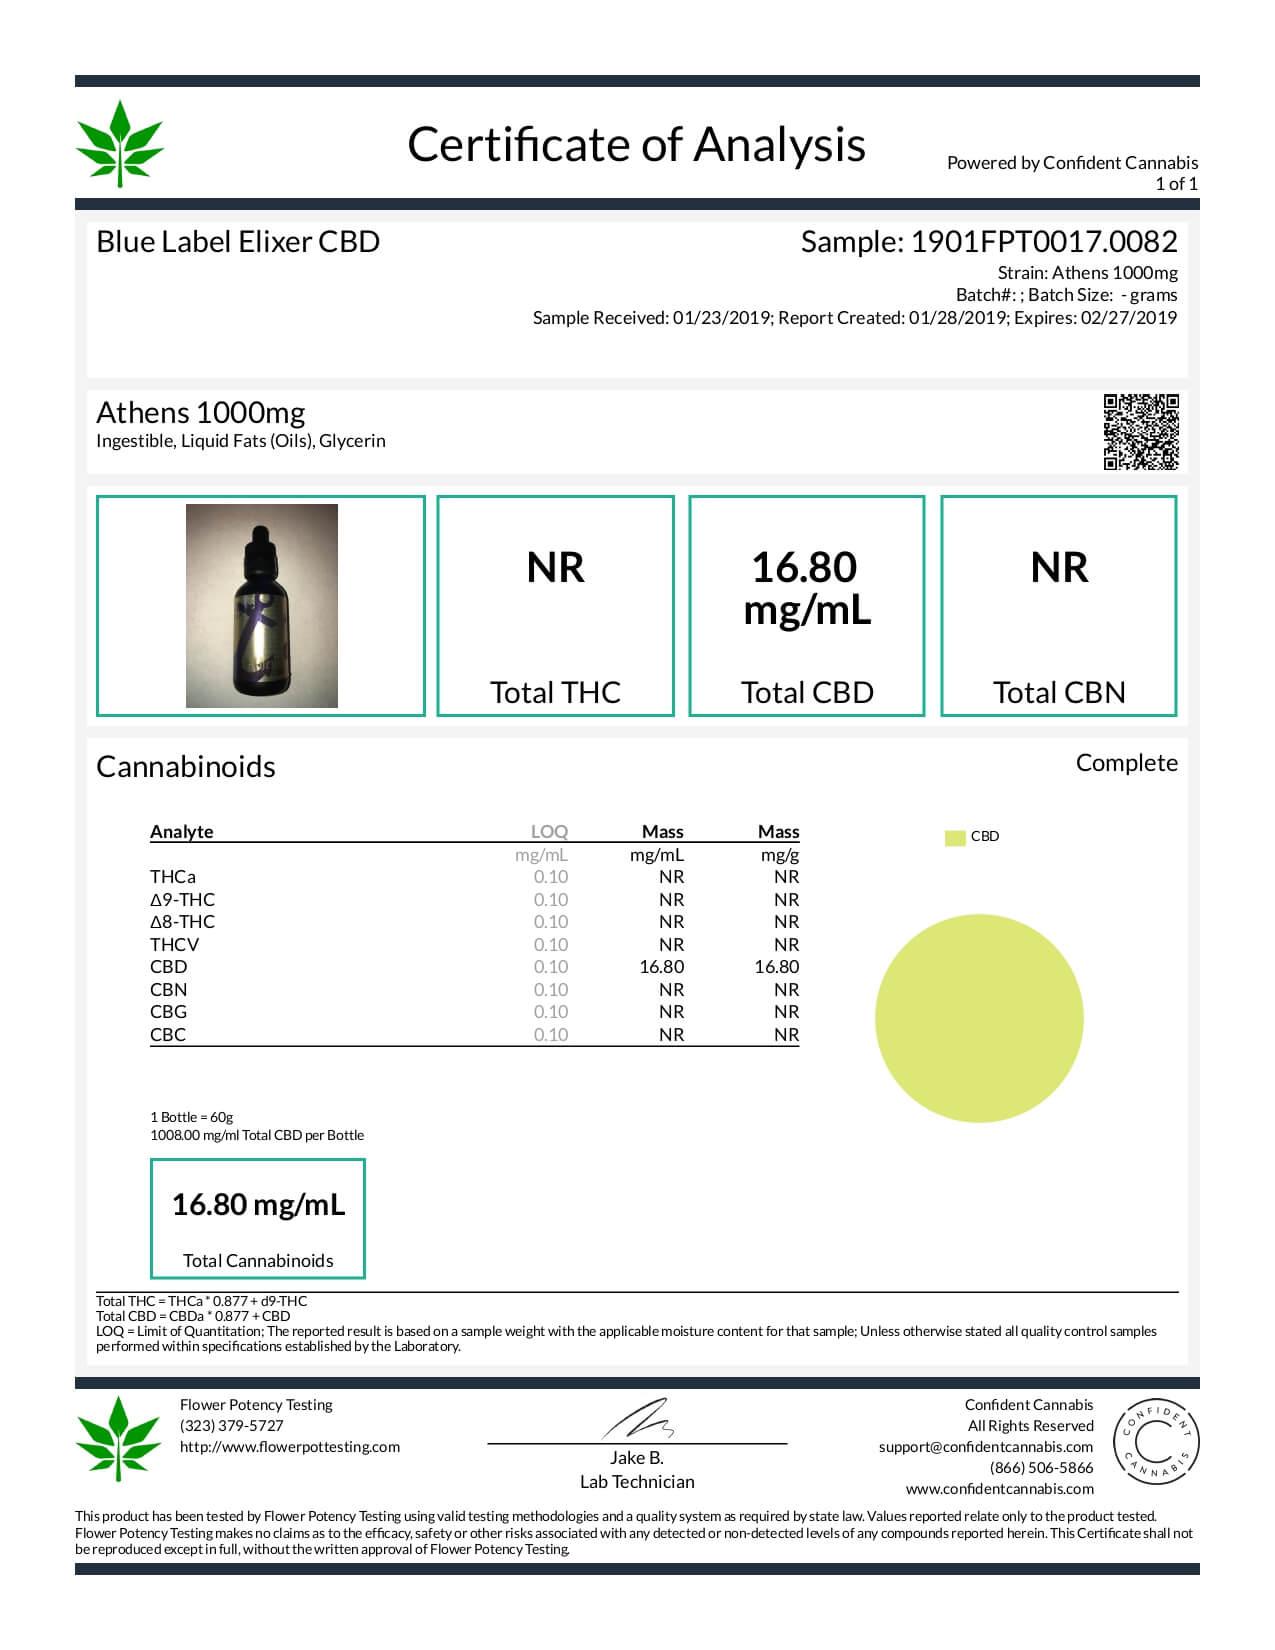 Blue Label CBD Vape Juice Athens 1000mg Lab Report